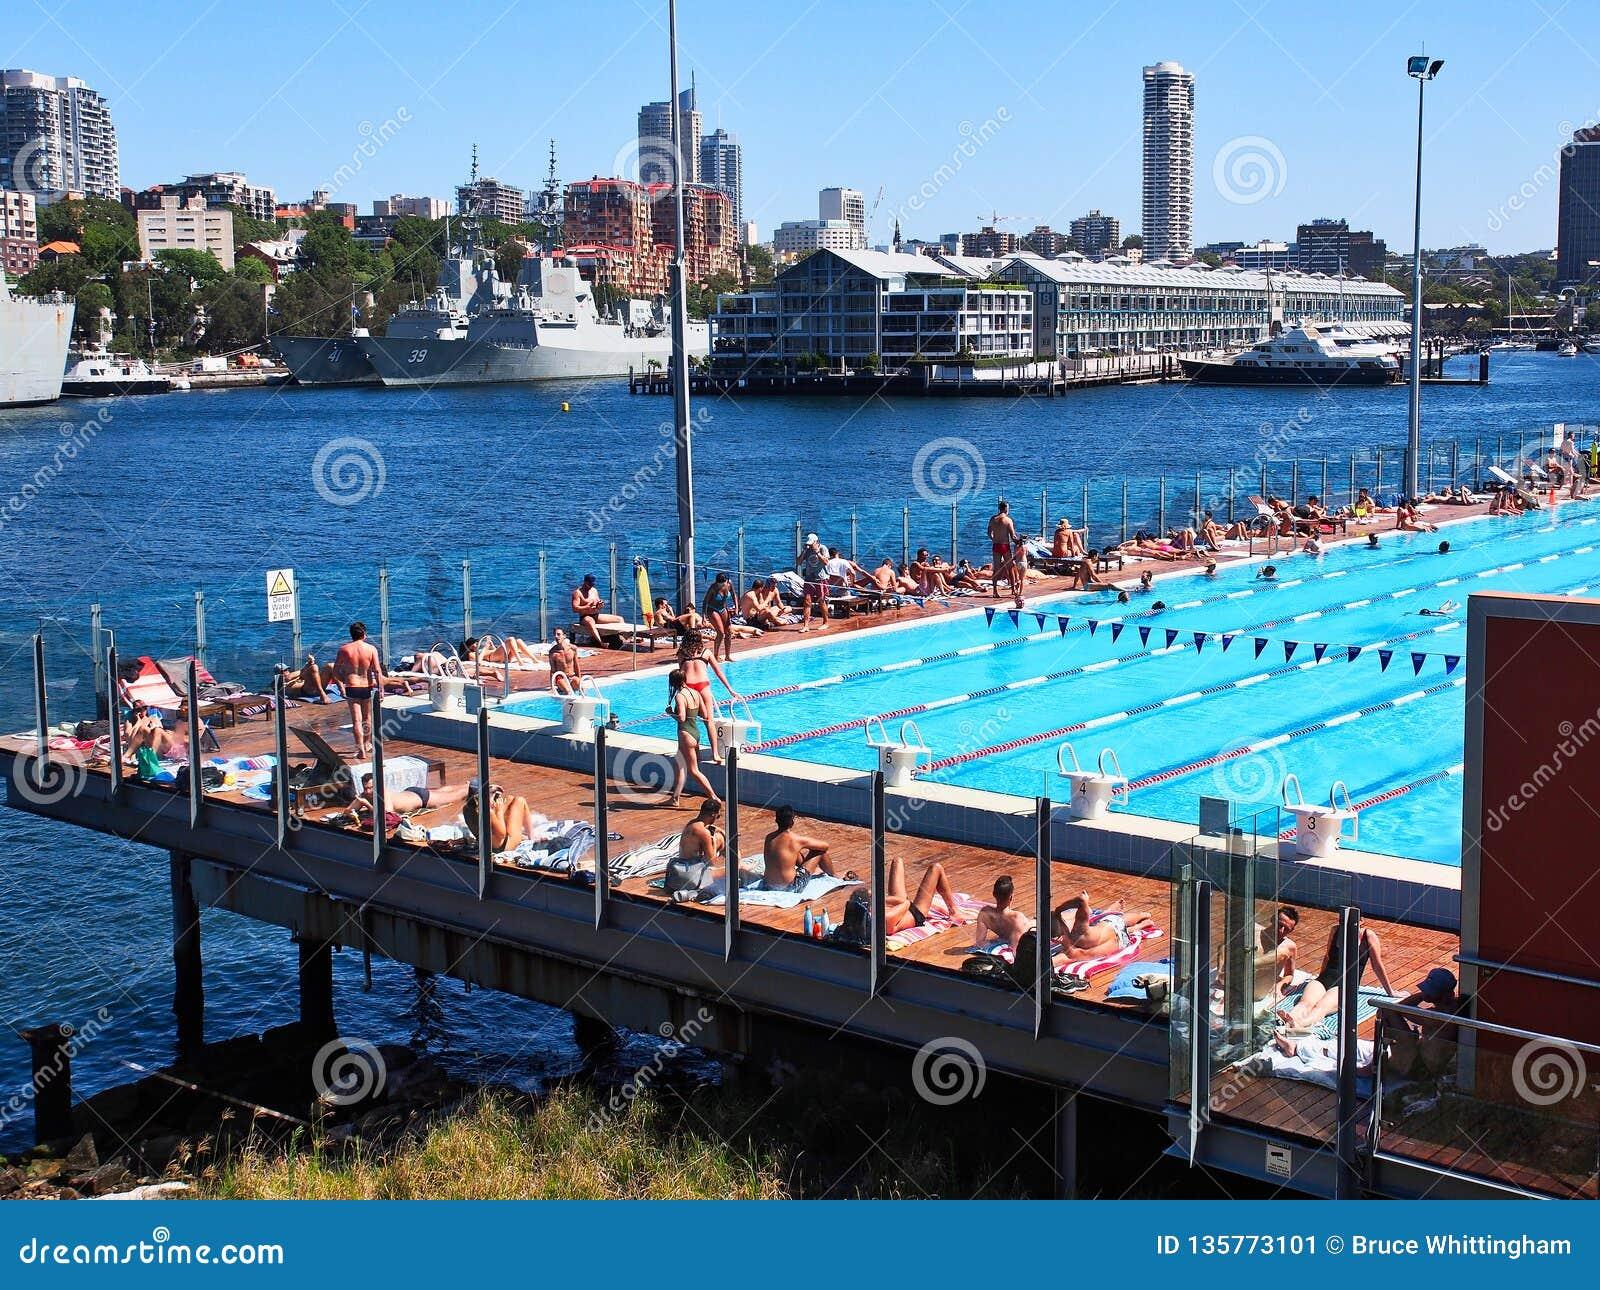 Boy Charlton Public Pool, Woolloomooloo Bay, Sydney